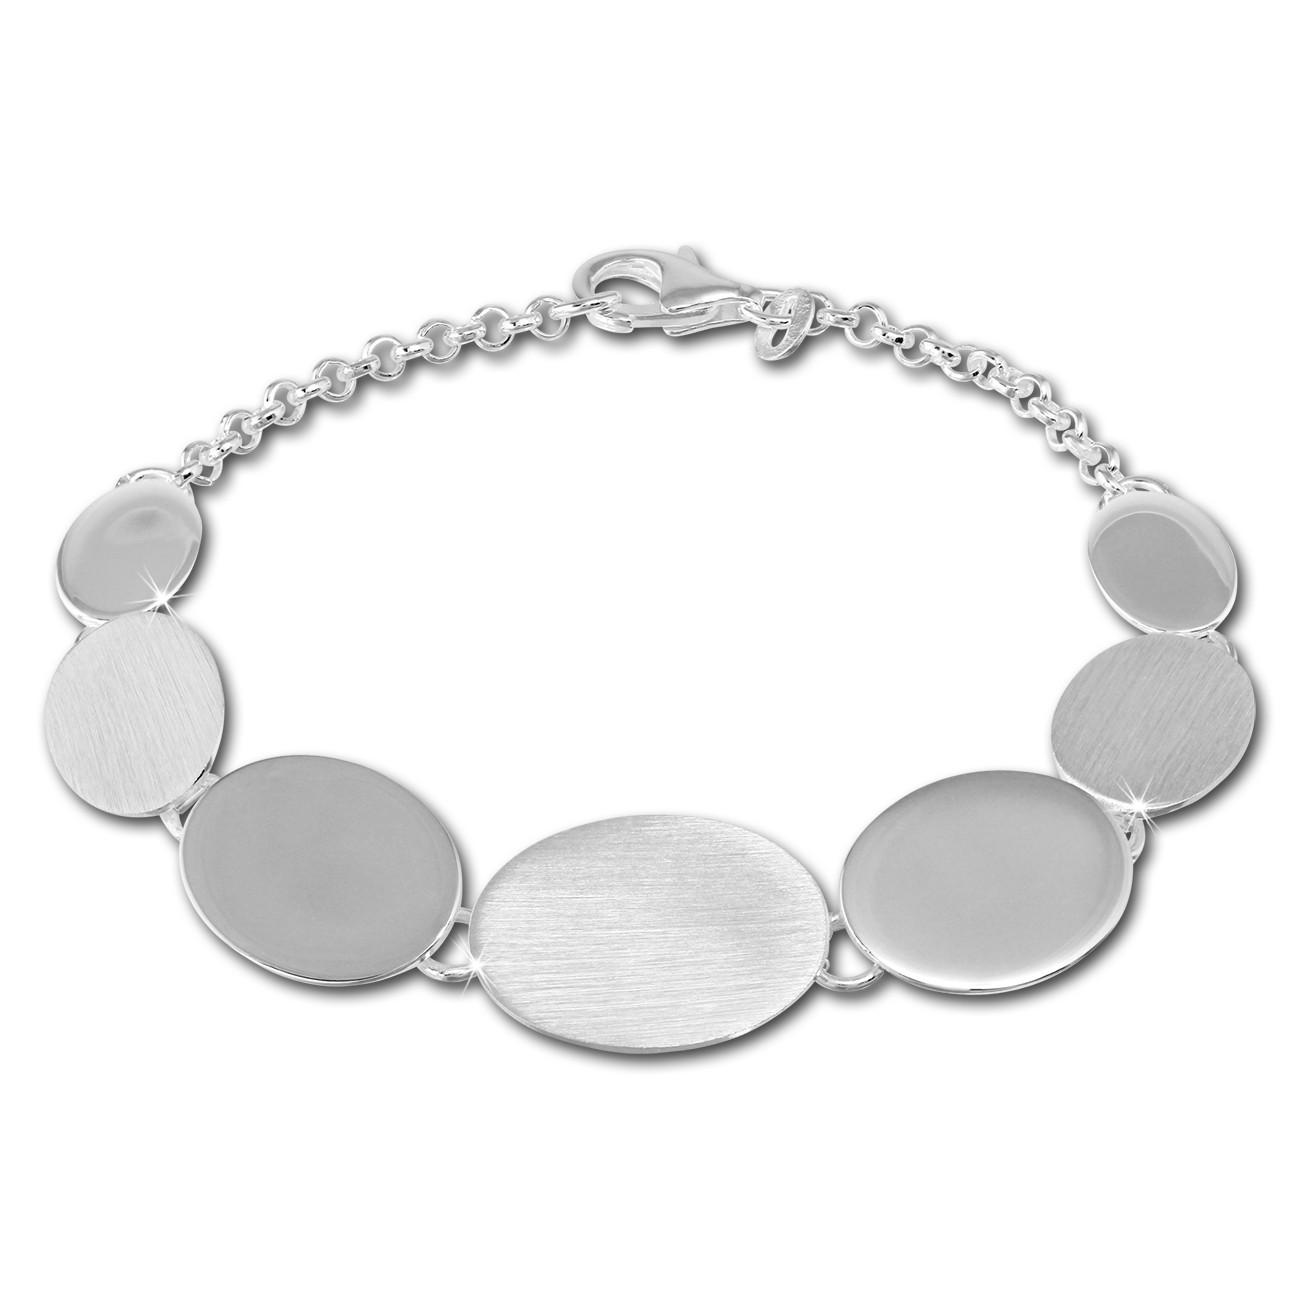 SilberDream Armband Oval matt/glänzend 925 Sterling Silber 19,5cm SDA434